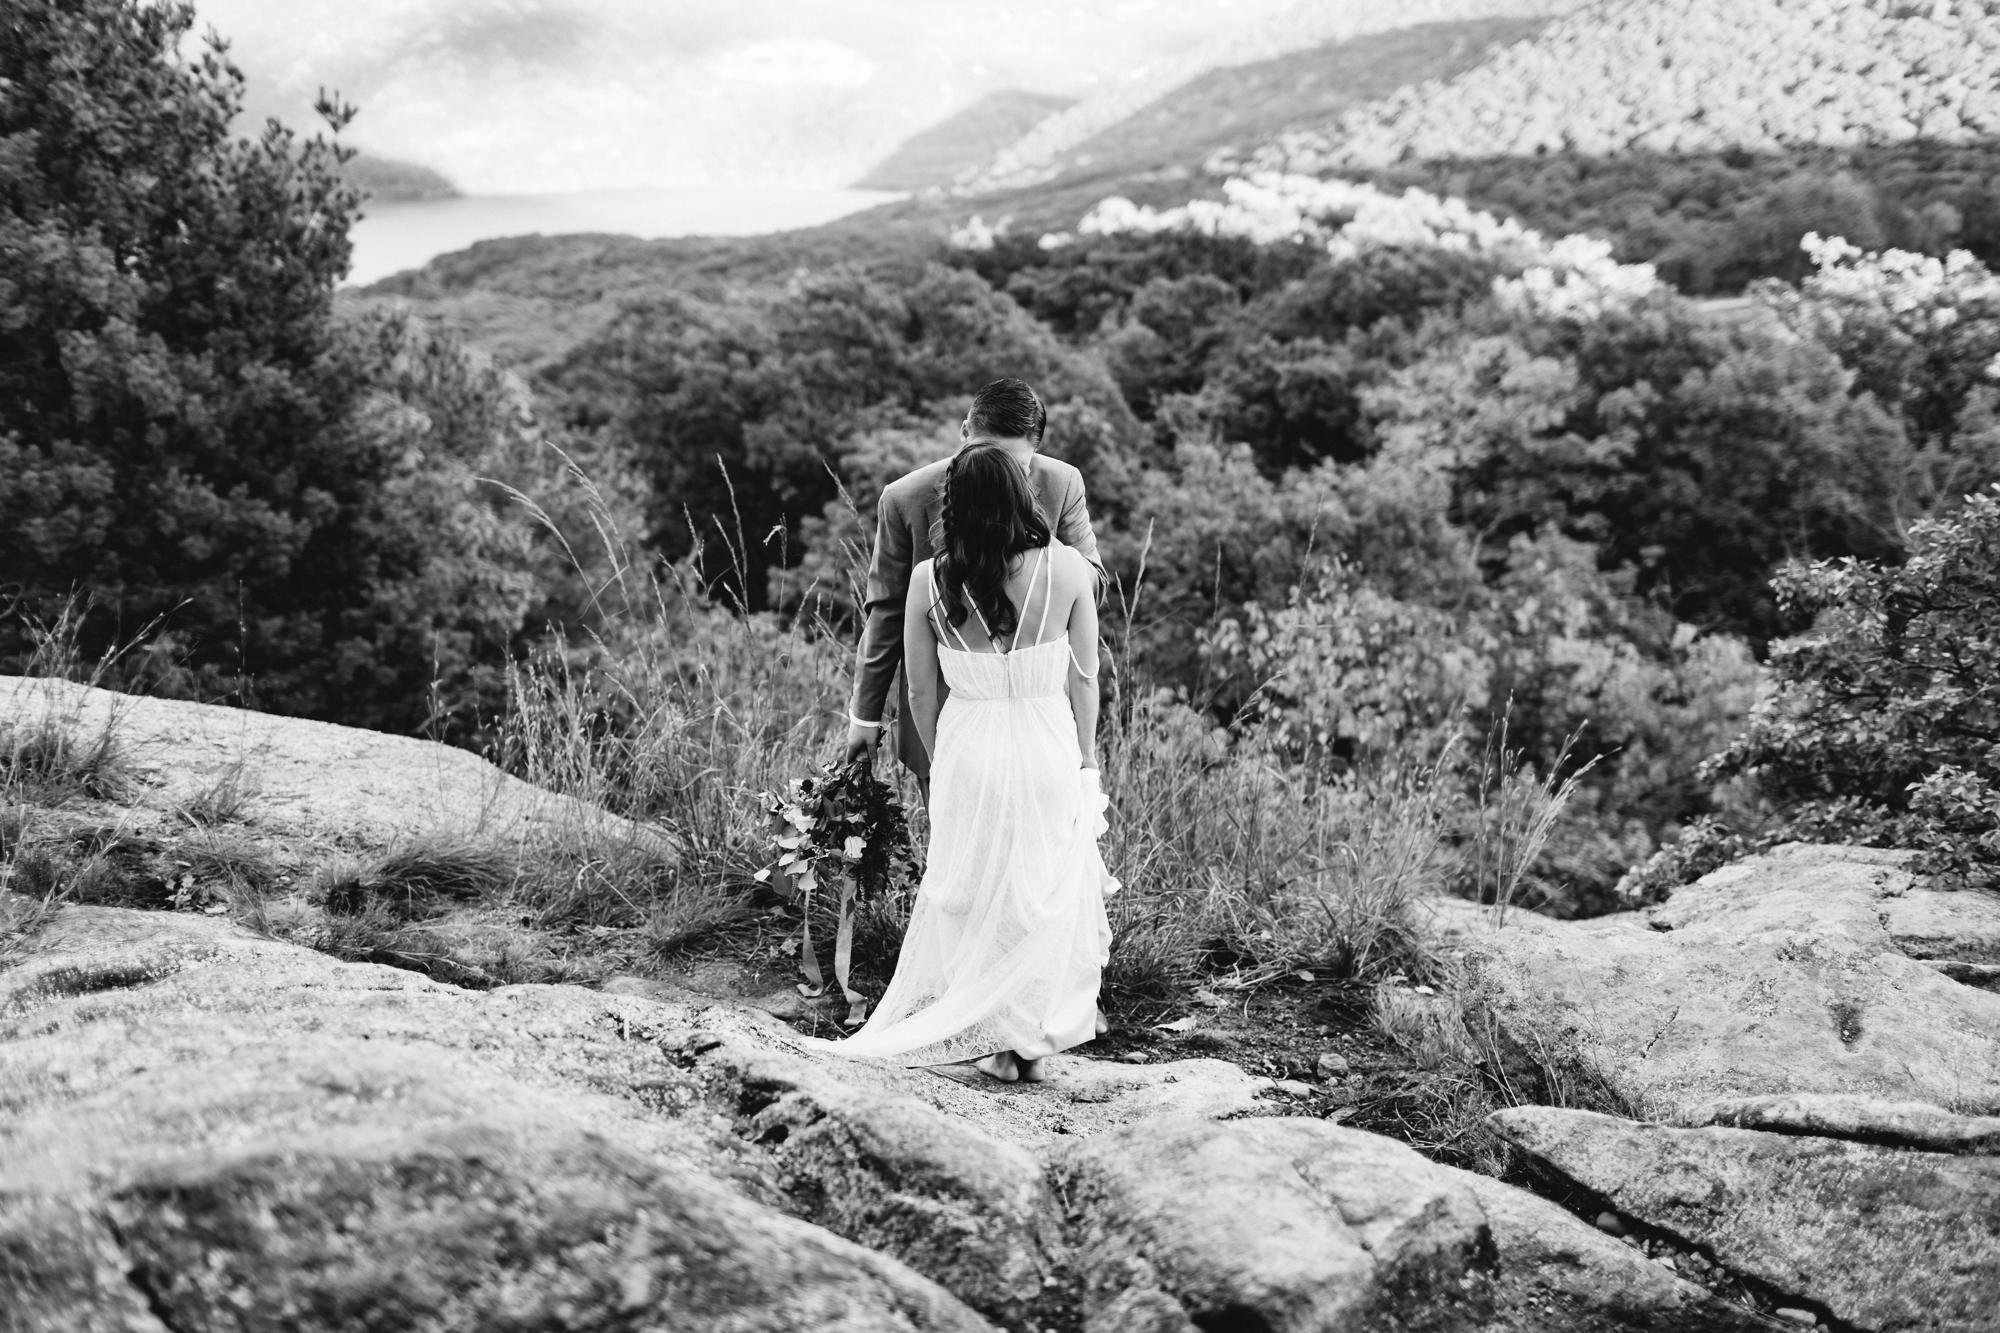 storm-king-mountain-elopement-emily-kirke-photography (27 of 40).jpg